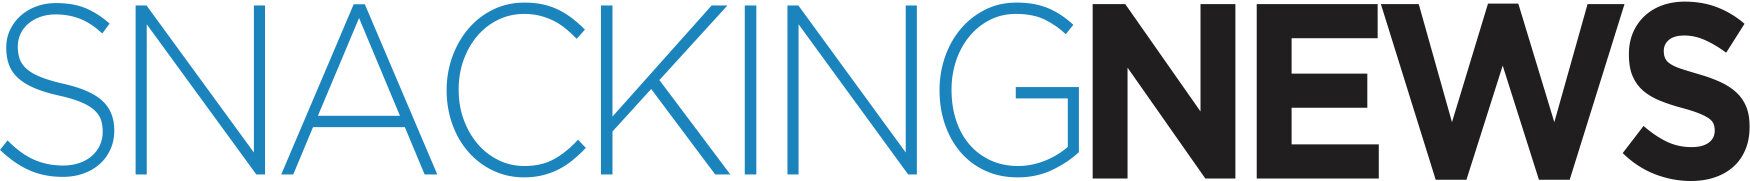 SnackingNews.logo_.jpg